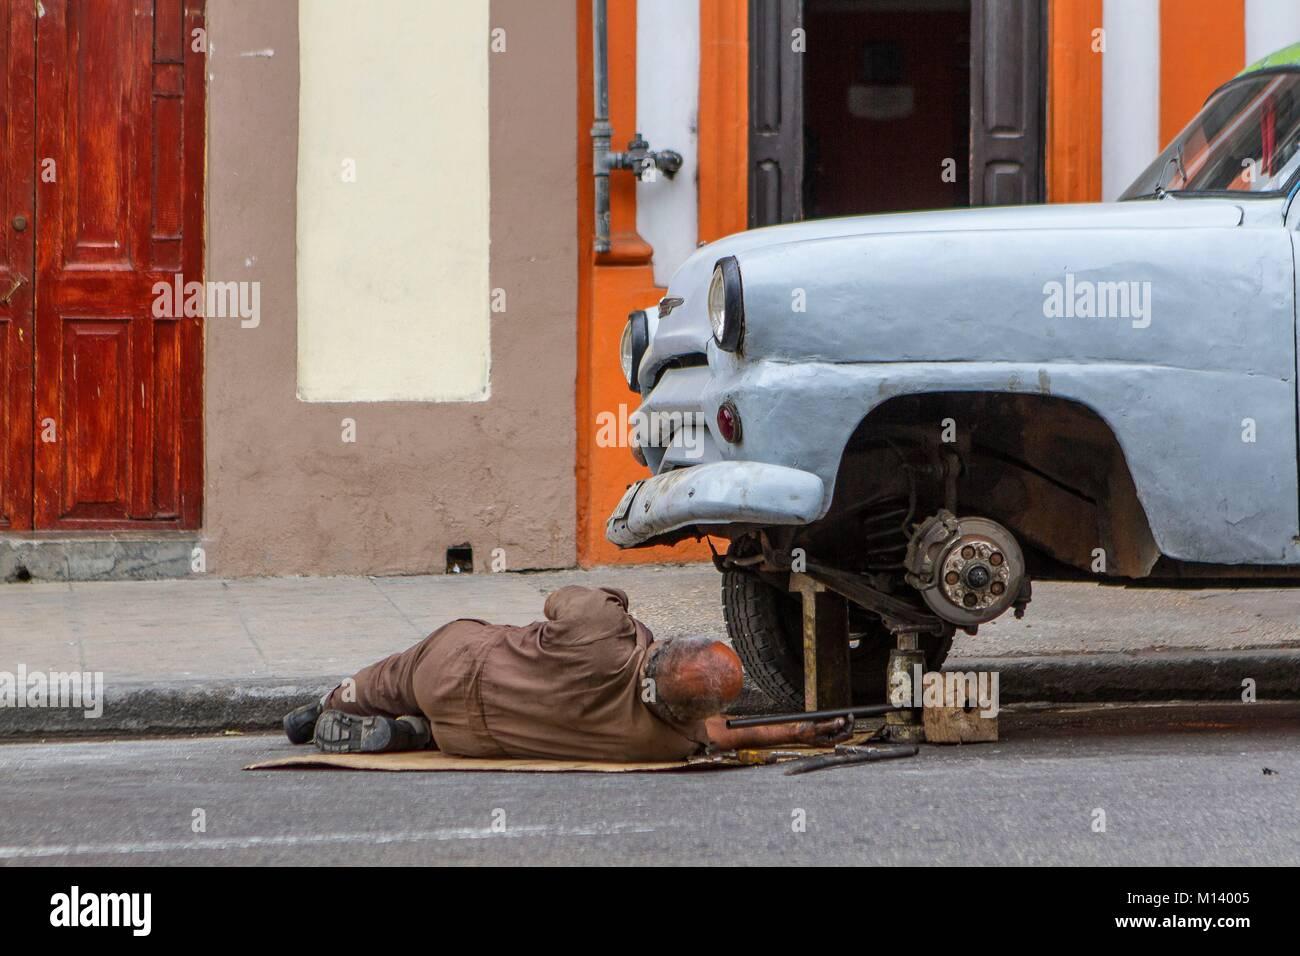 Cuba, province of Ciudad de la Habana, Havana, district of Centro Habana, man repairing an old american car Stock Photo